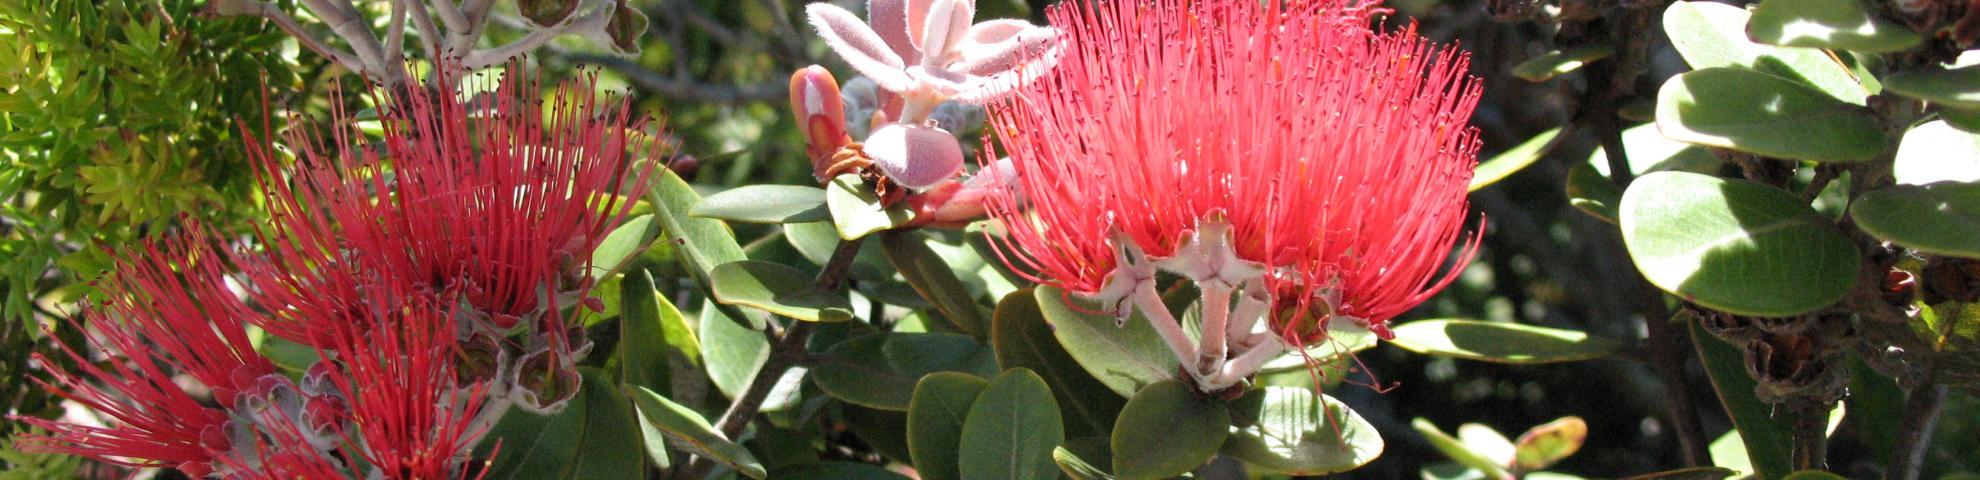 Laupahoehoe flowers